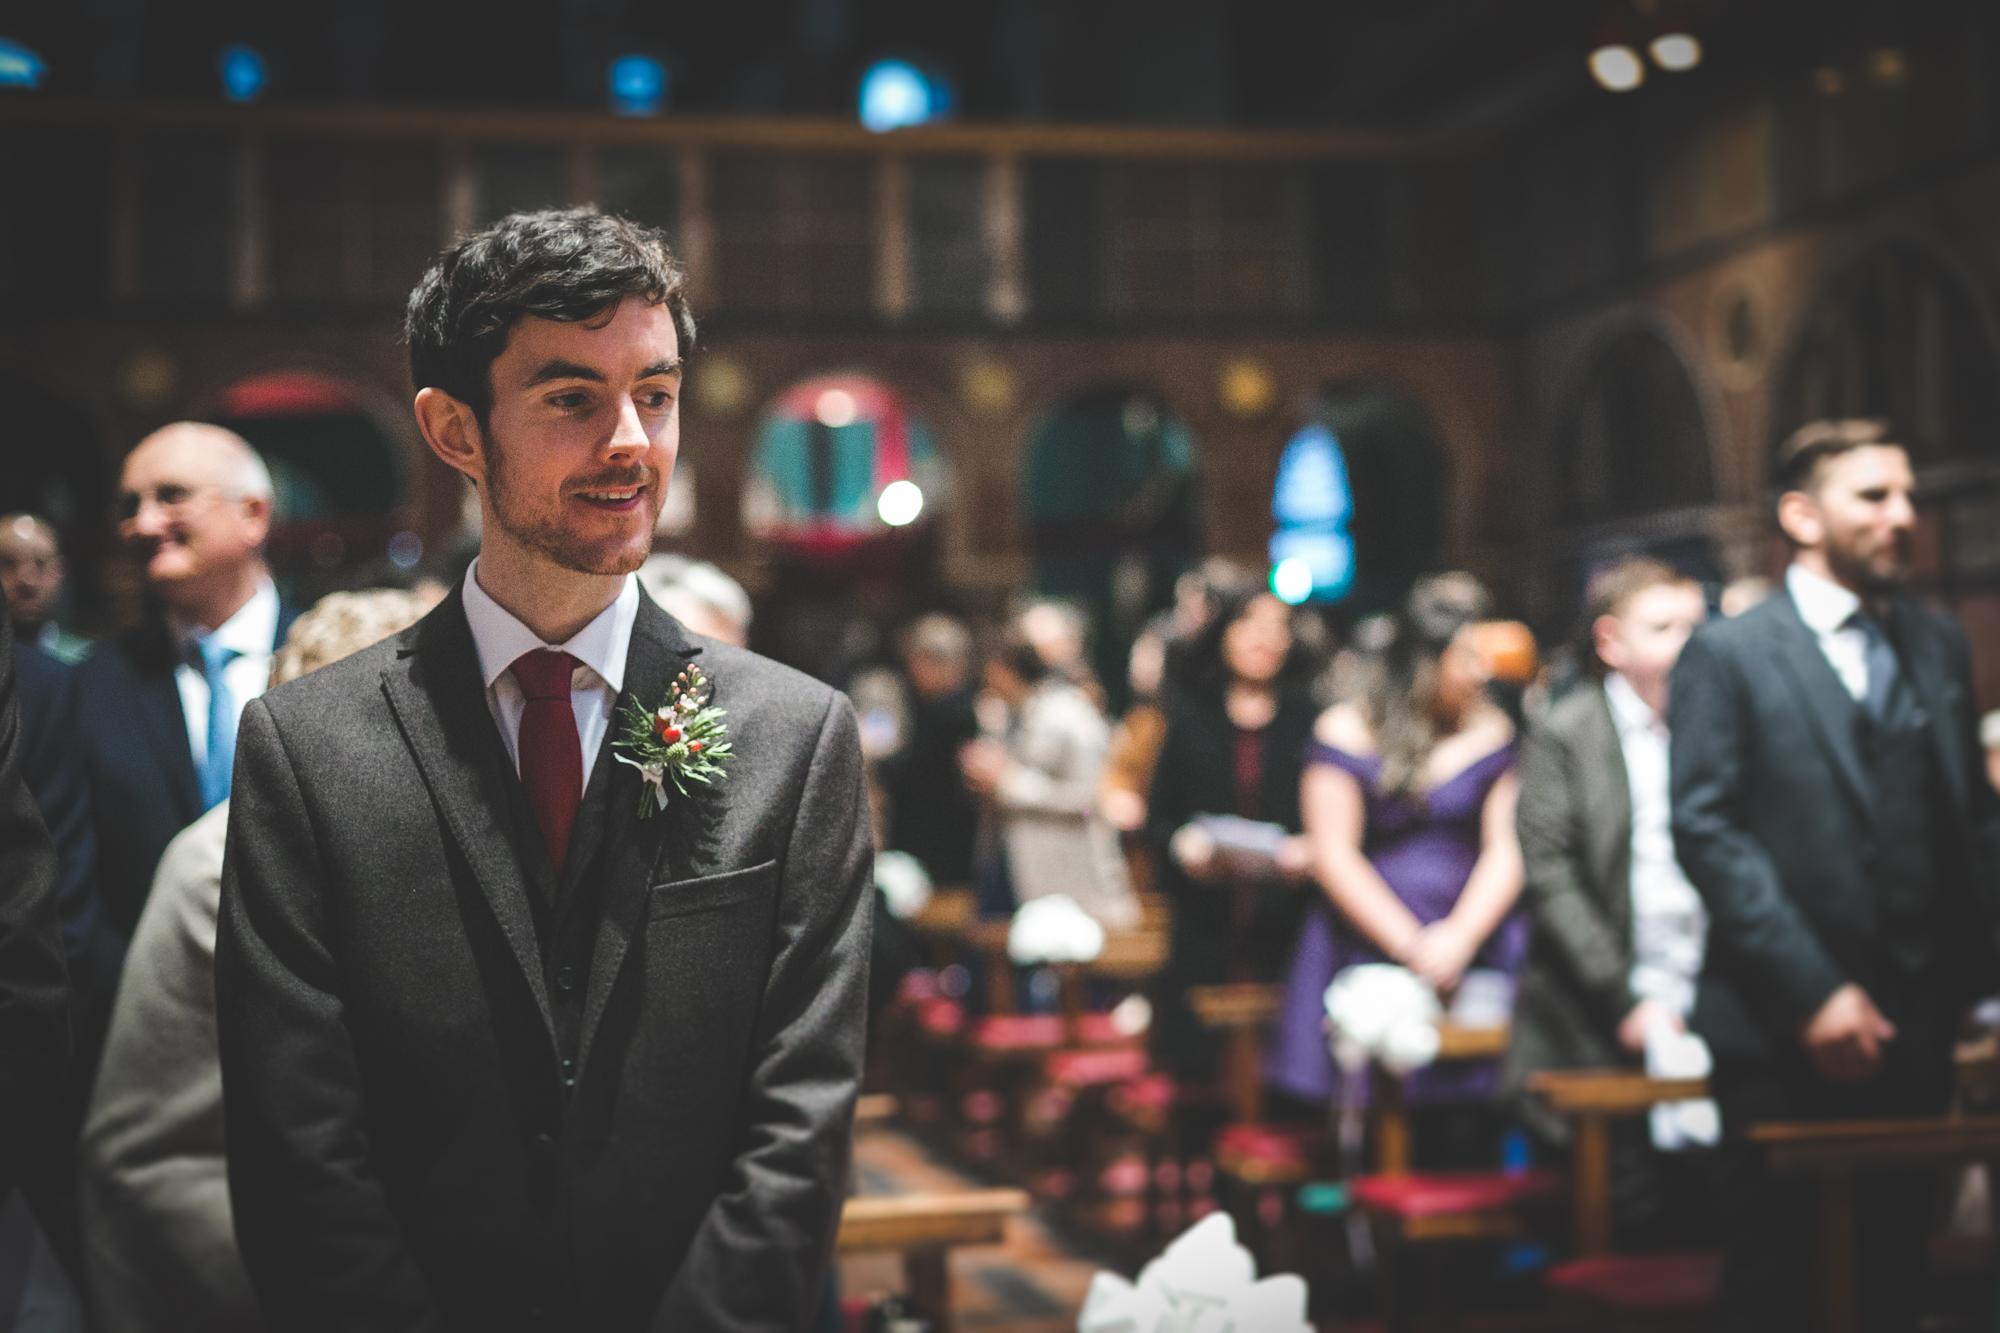 Hibernian Club wedding058.jpg